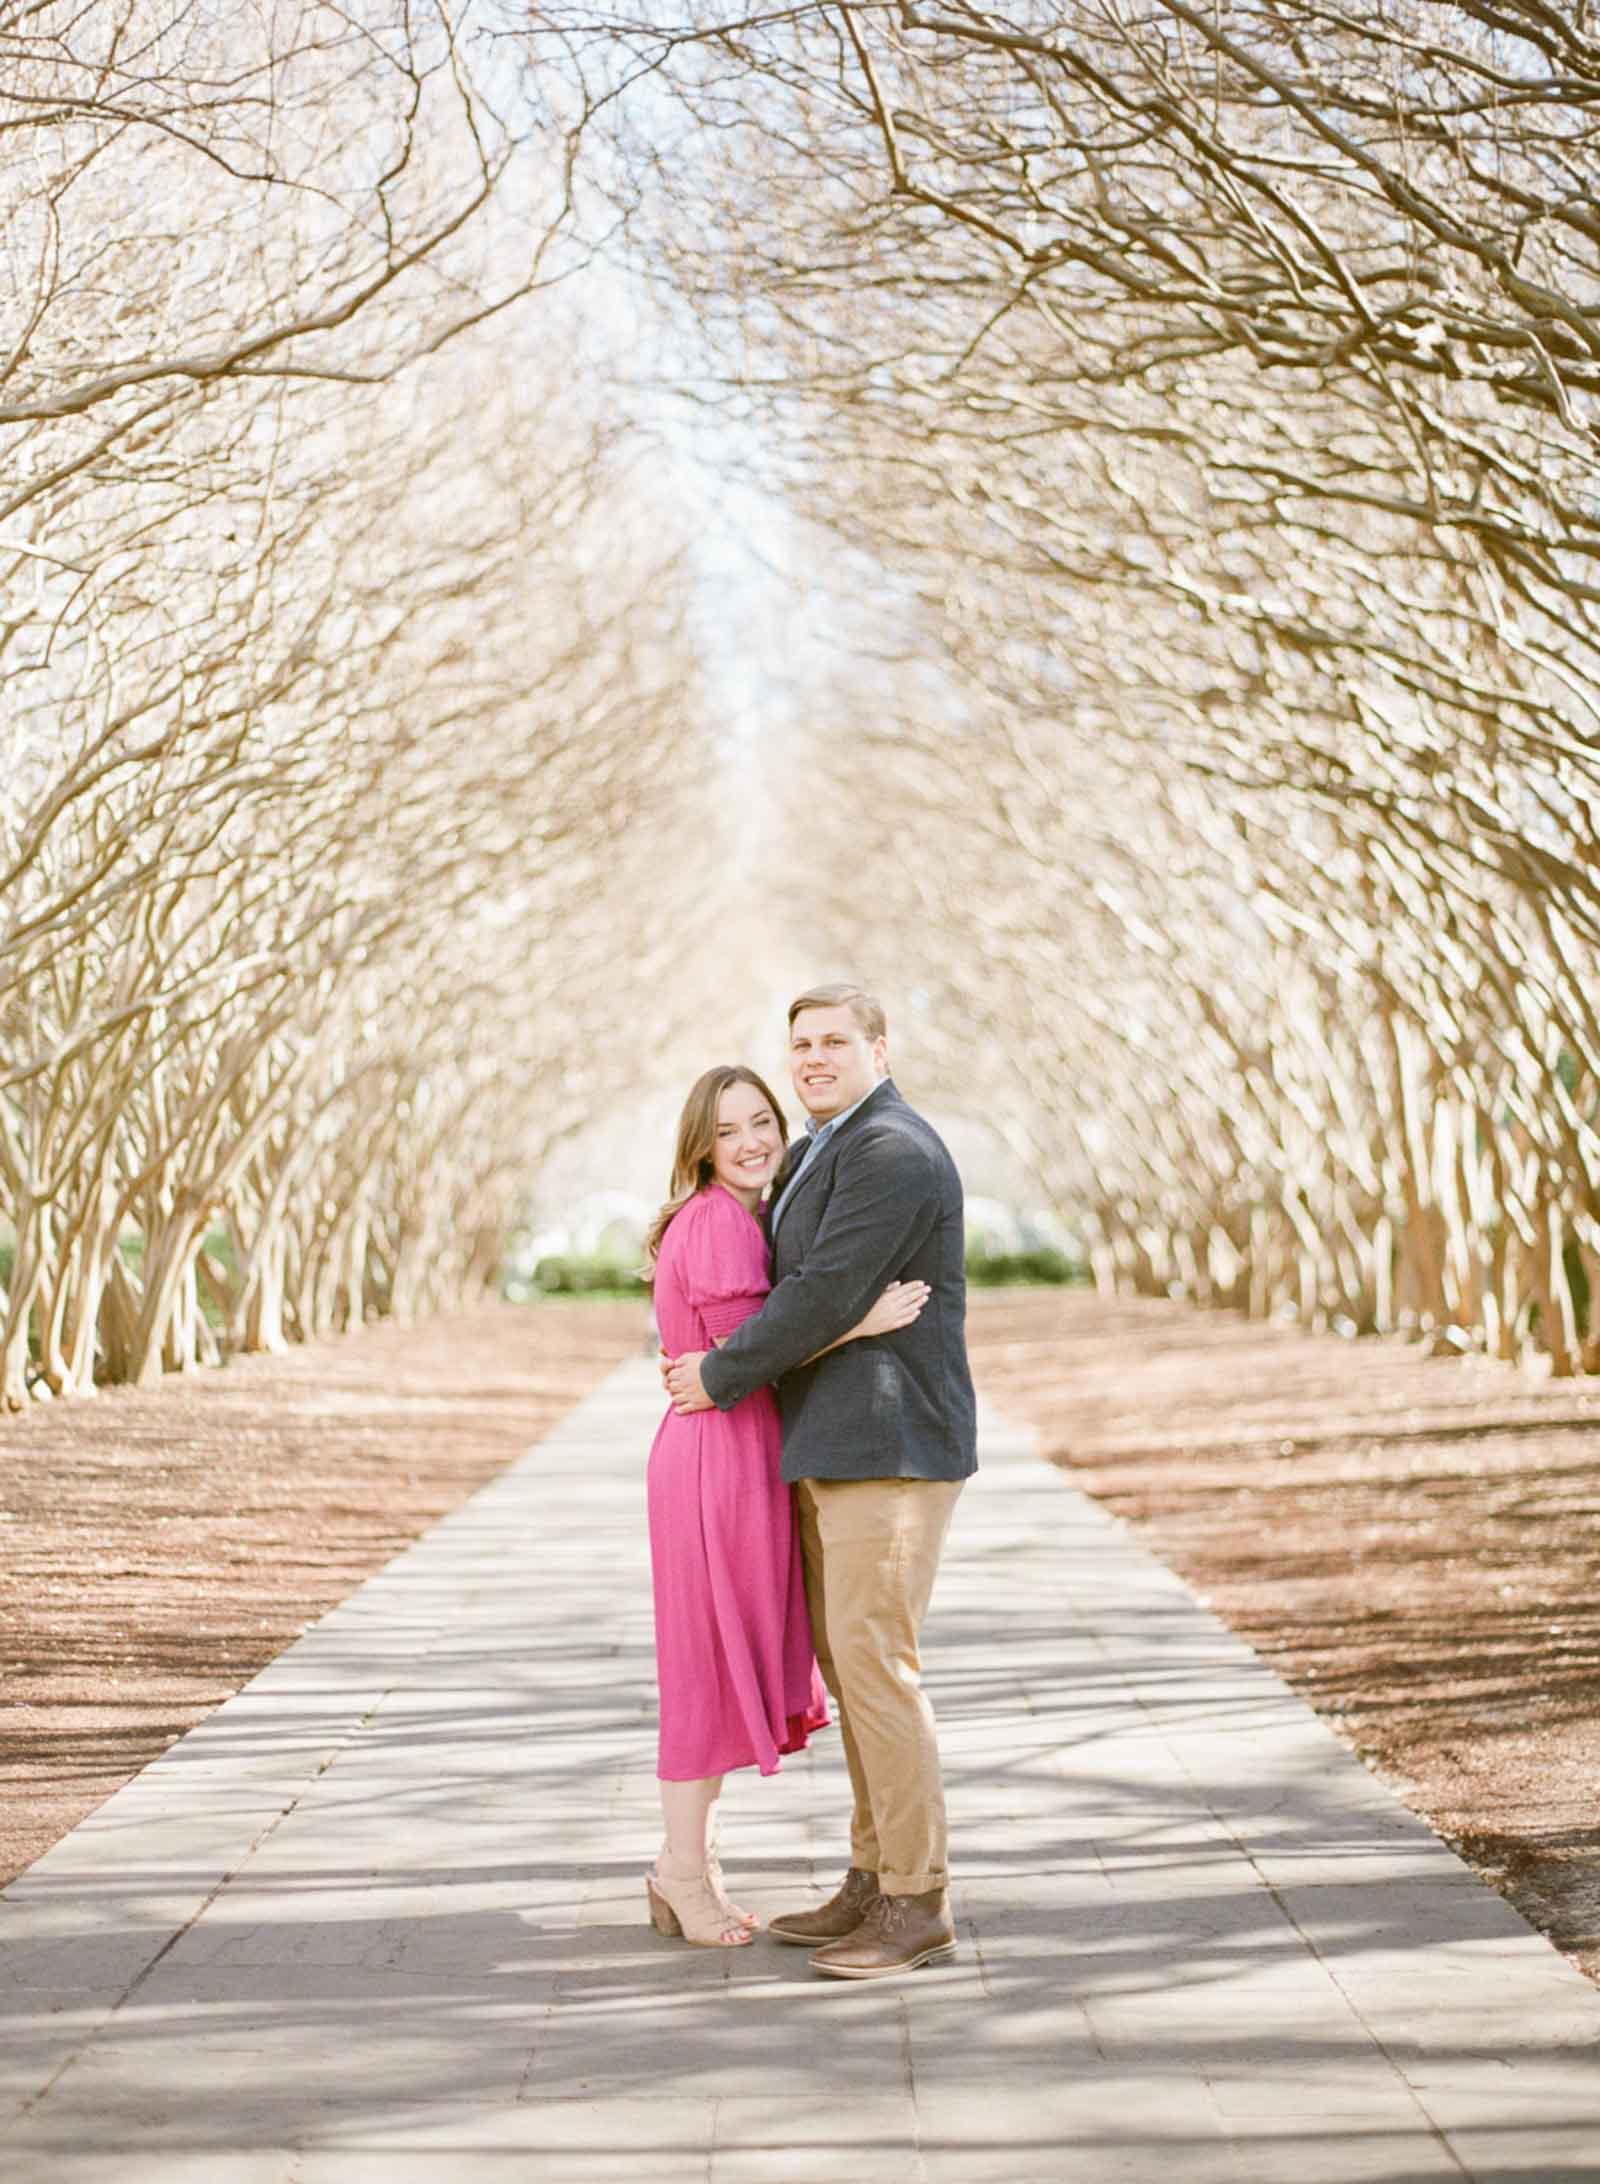 Dallas Arboretum Engagement-JenSymes-75.jpg